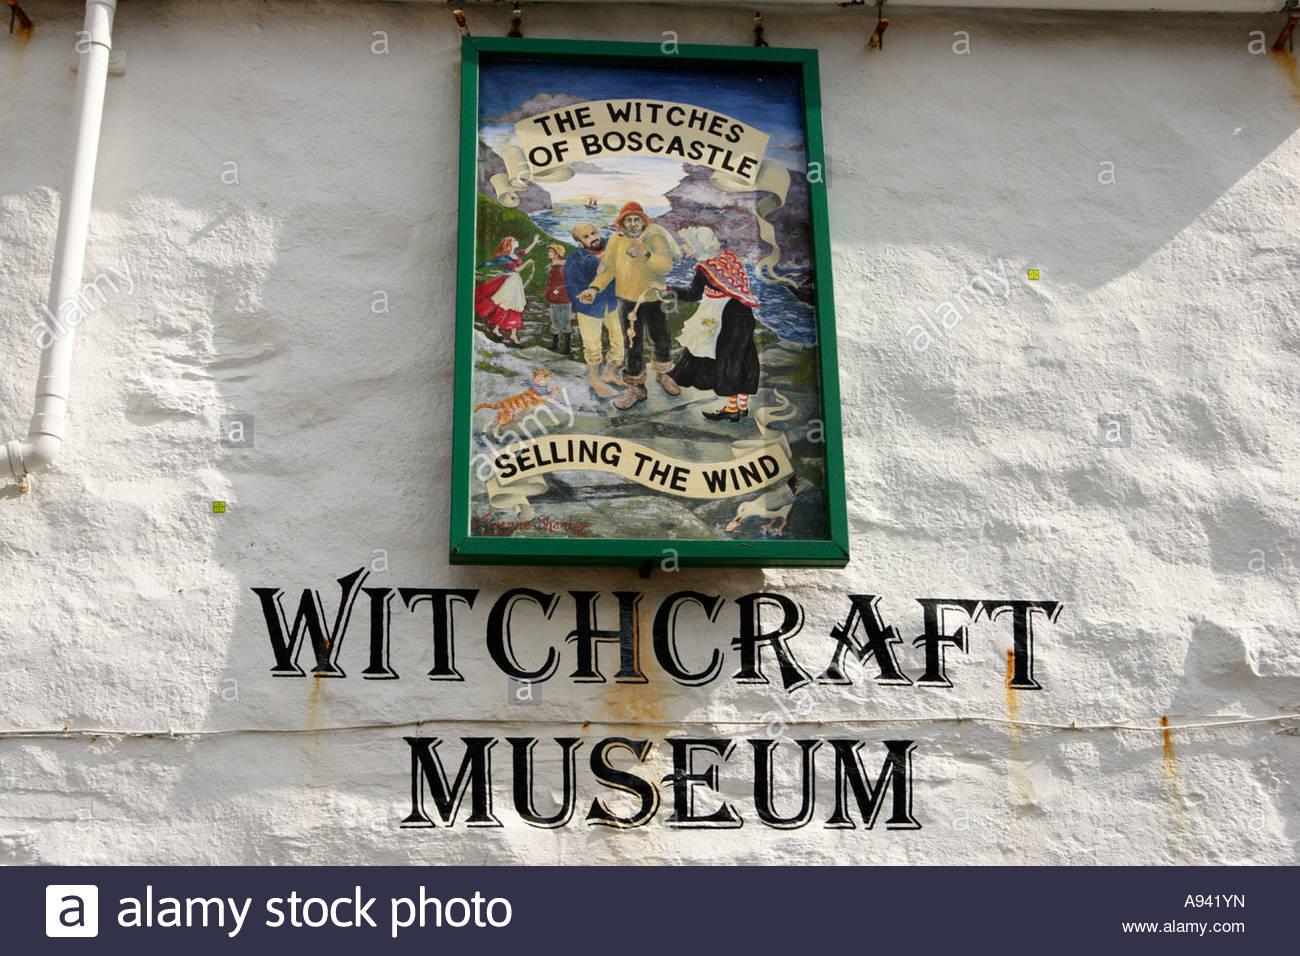 Witchcraft Museum, Boscastle, Cornwall, UK . - Stock Image